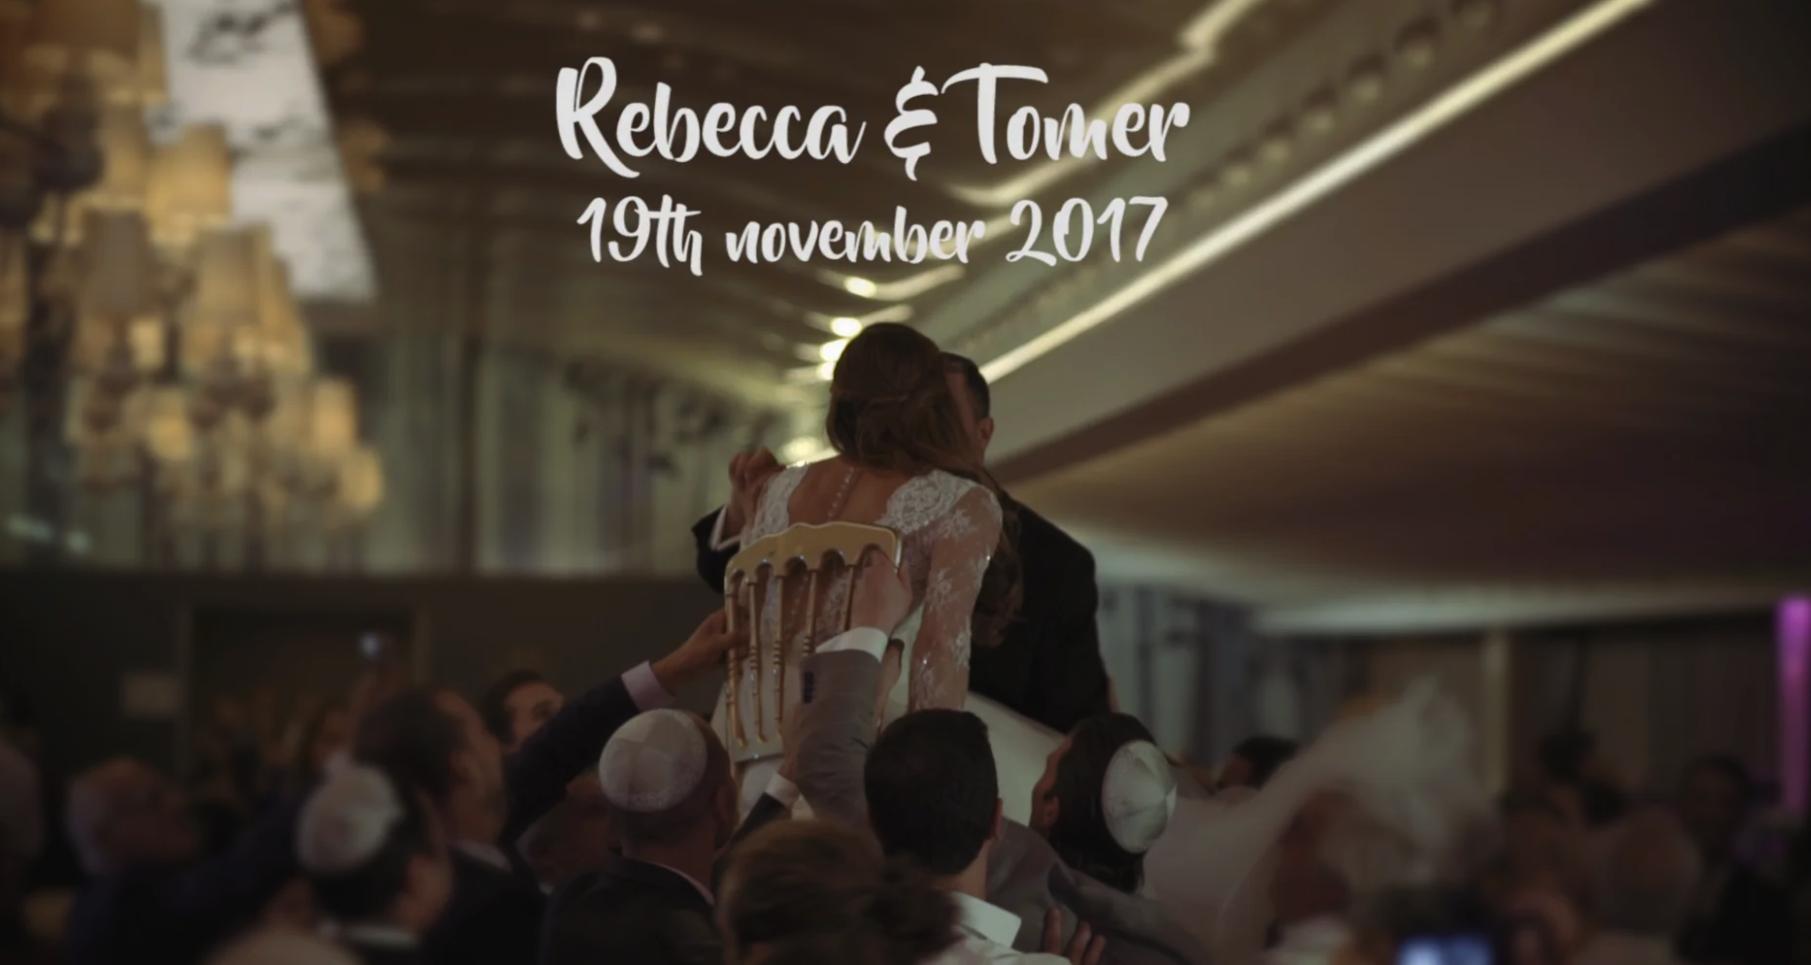 Rebecca + Tomer | Barcelona, Spain | Hotel Fairmont Barcelona